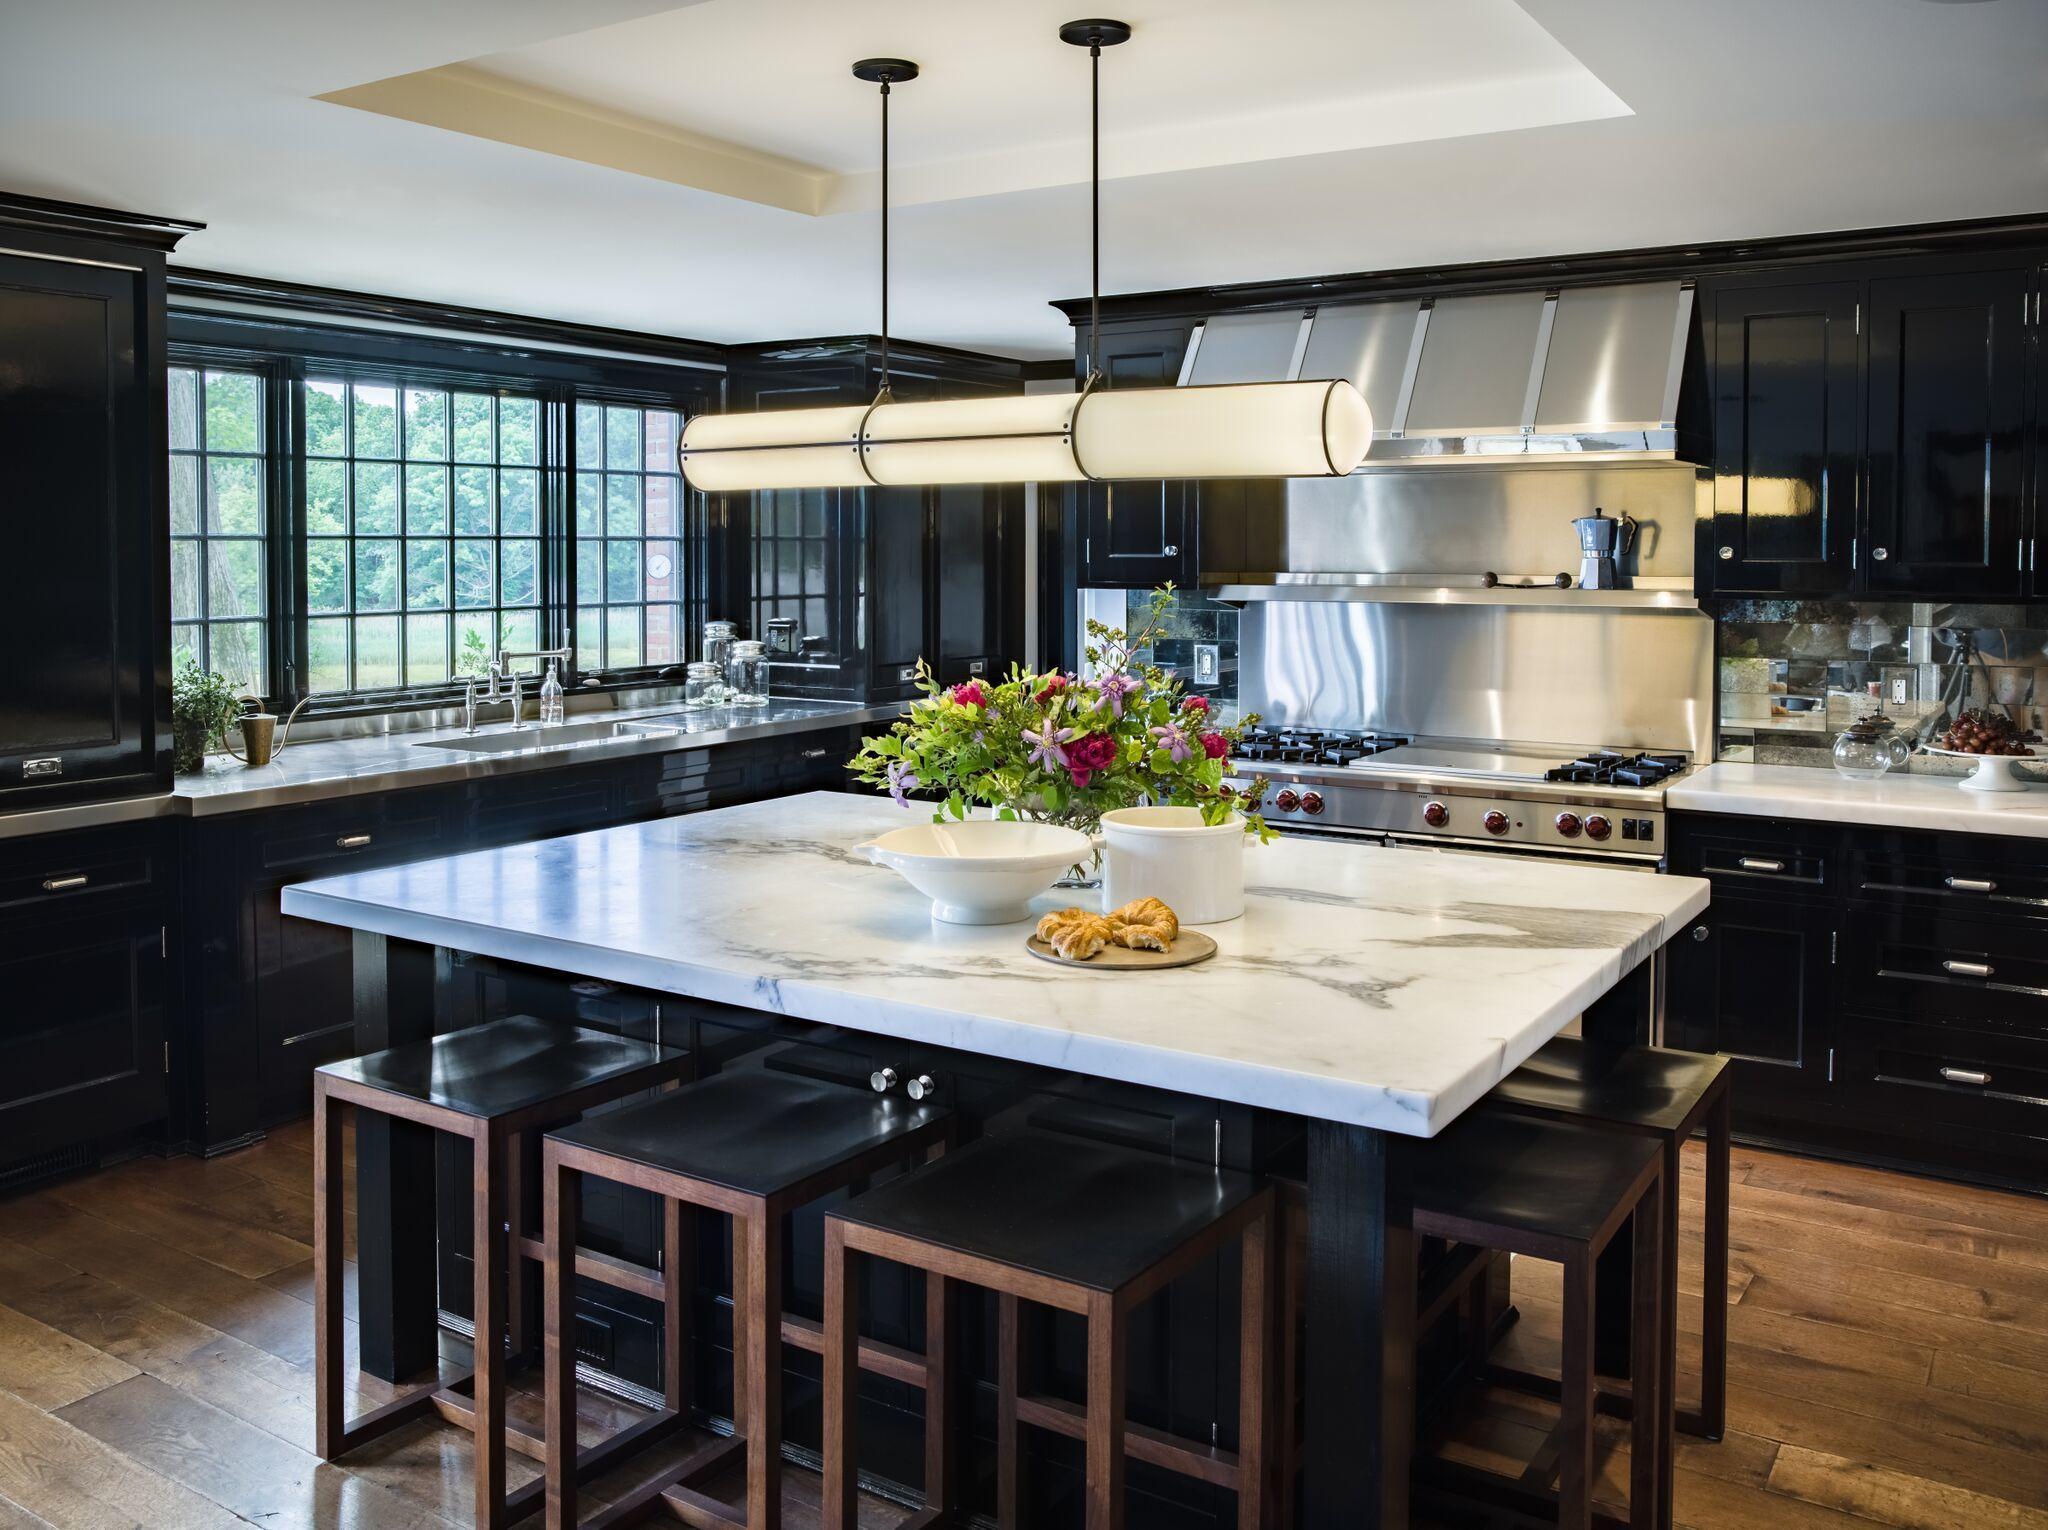 u003cpu003eu003cem data-redactor-tagu003d em  data- & 30 Sophisticated Black Kitchen Cabinets - Kitchen Designs With Black ...